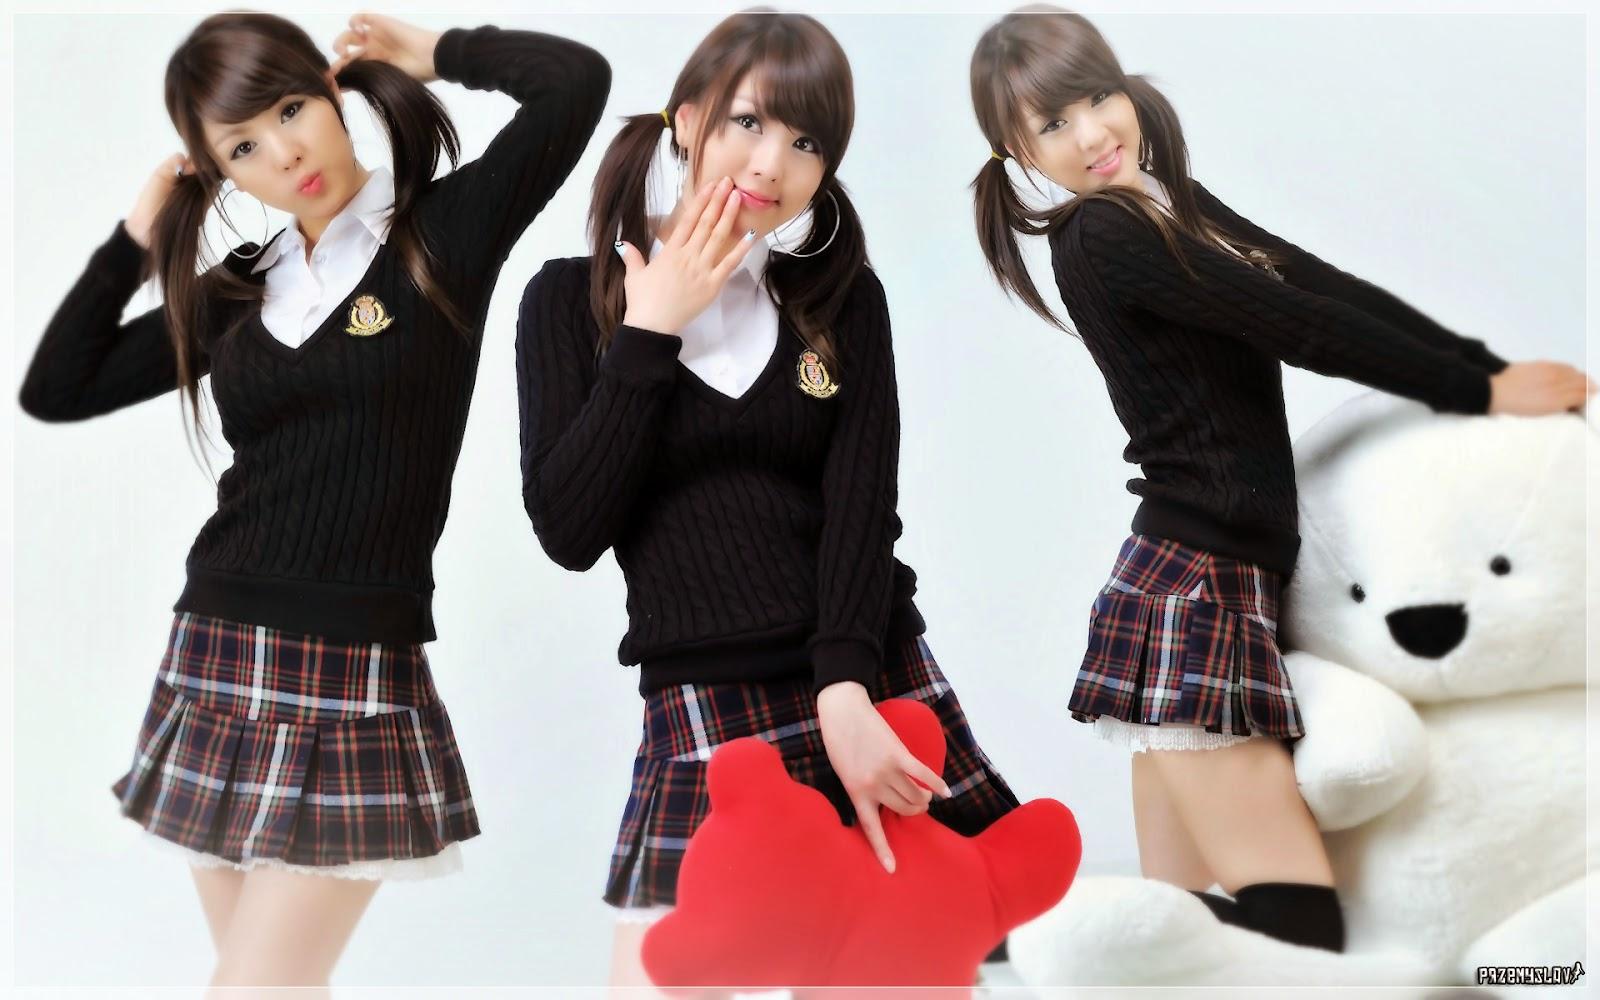 Chinese School Girls Wallpaper